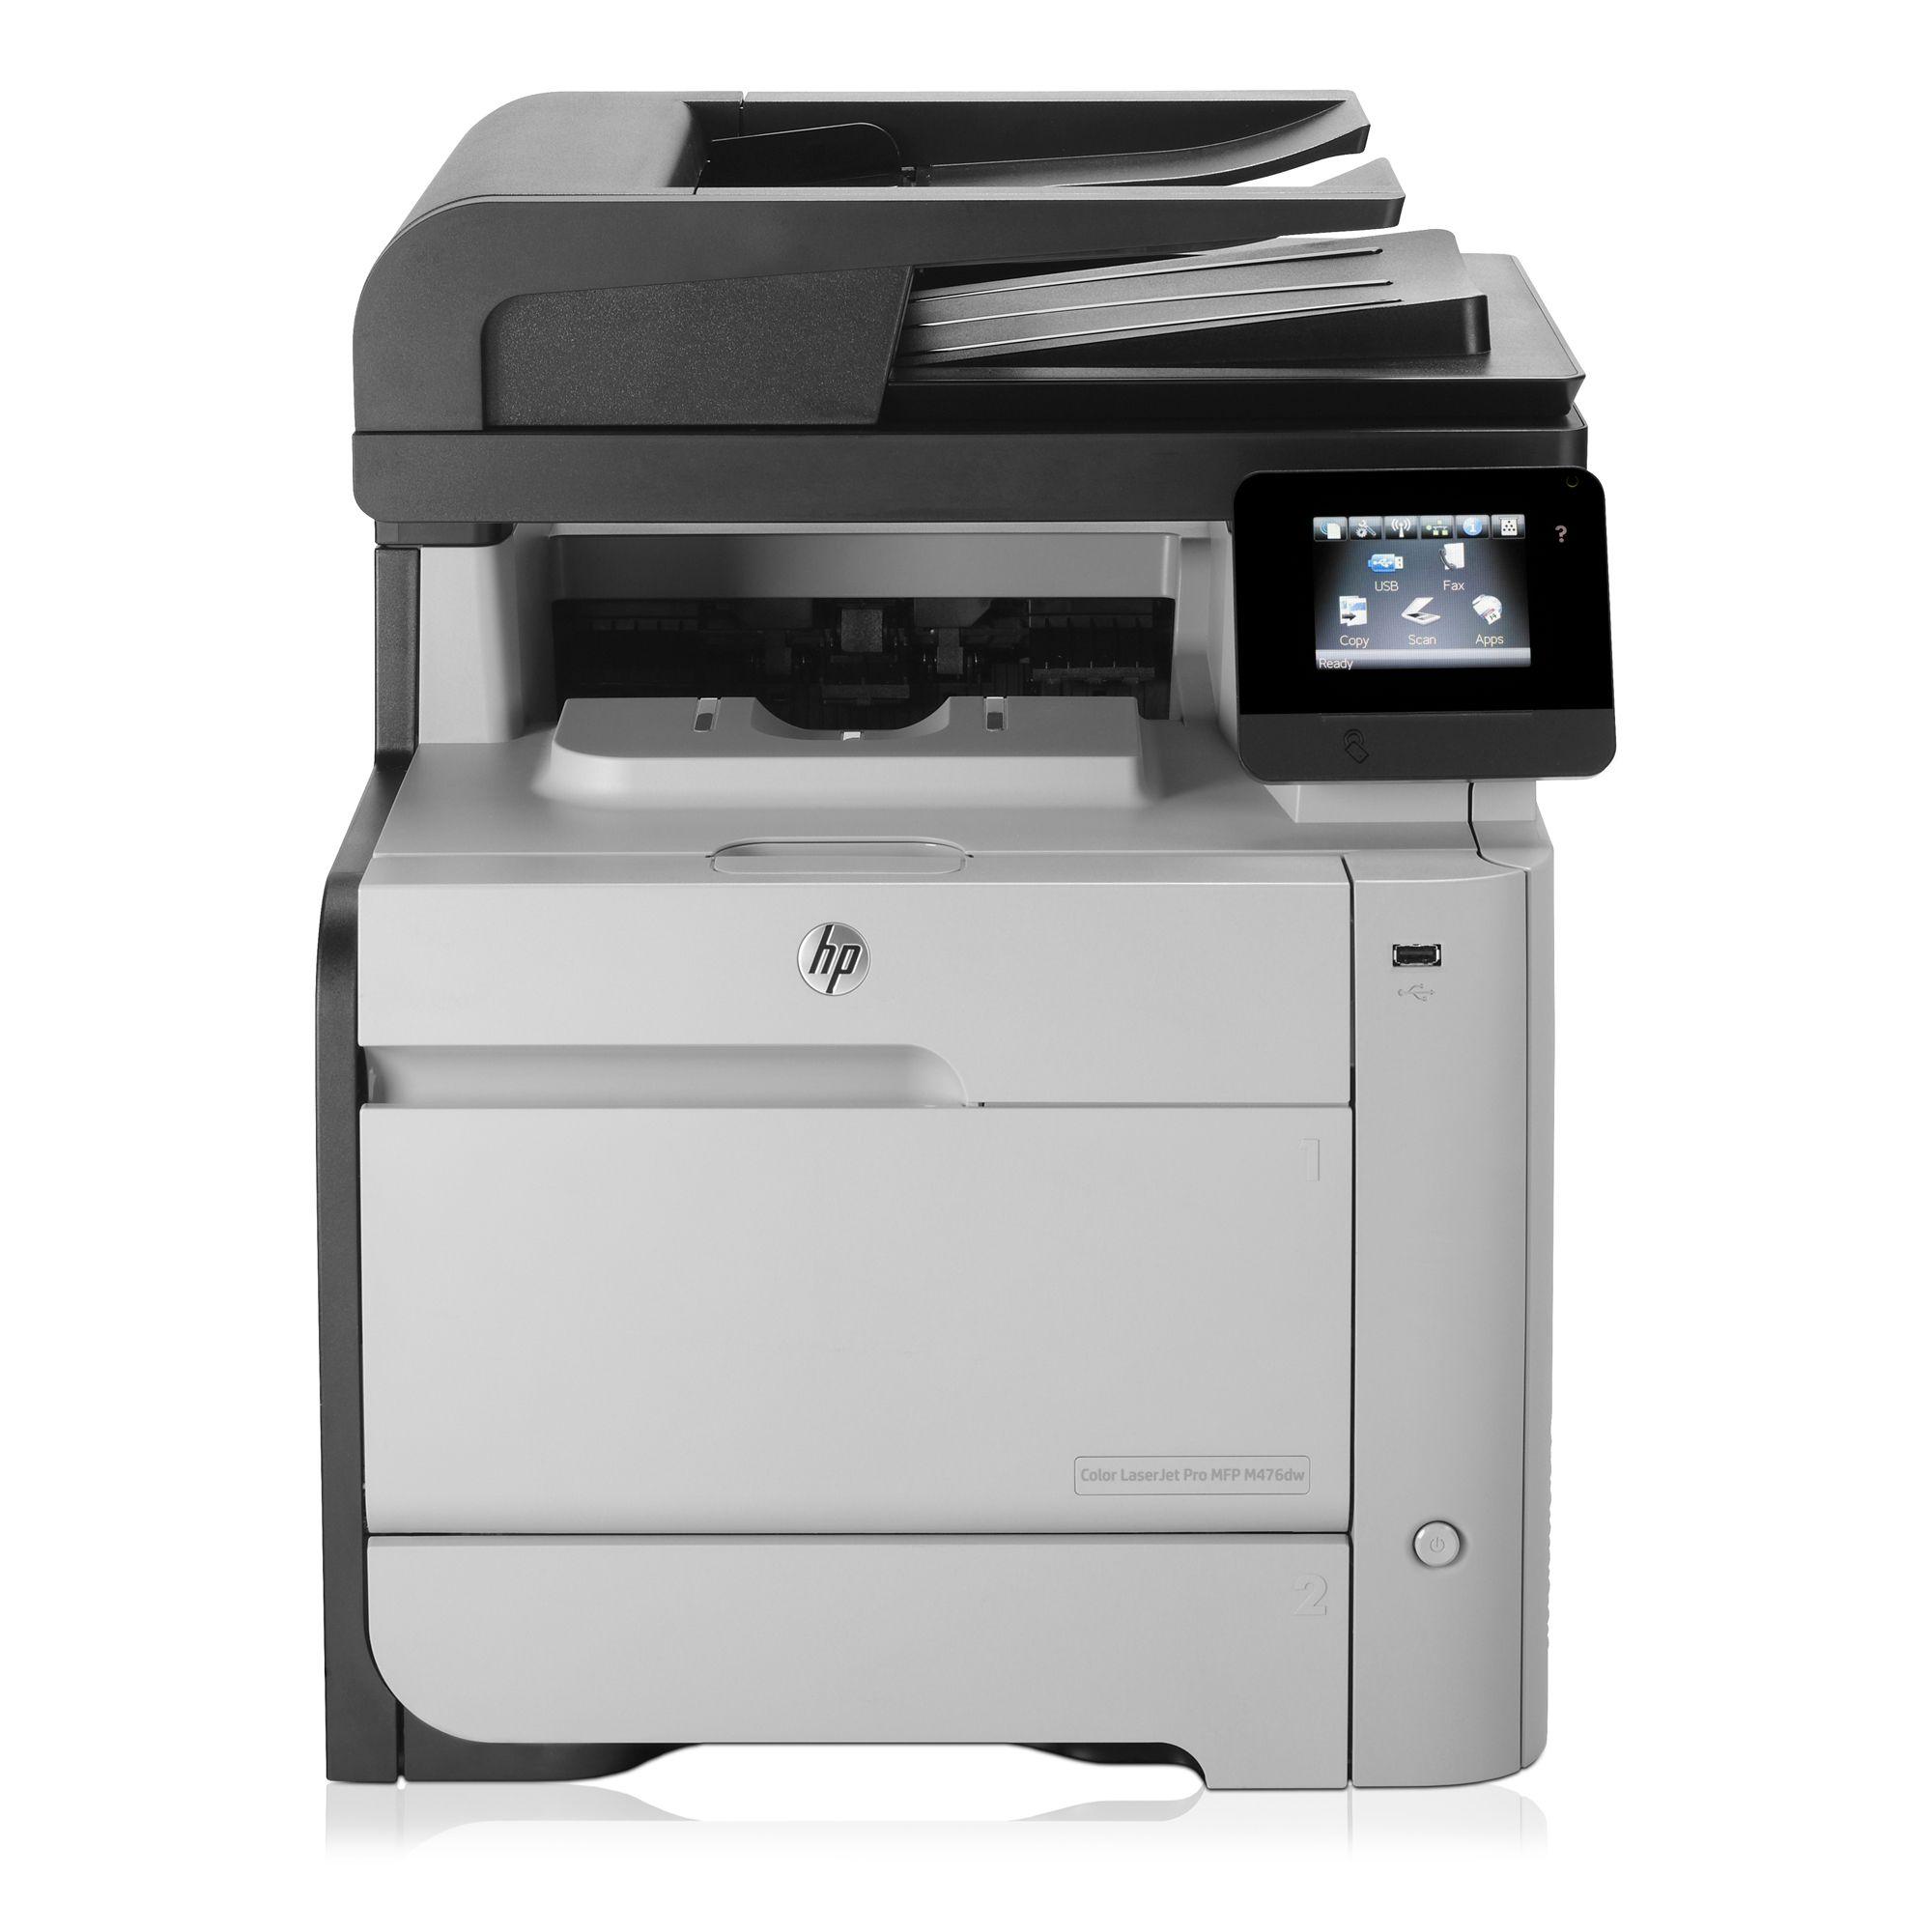 Multifunctionala Second Hand HP Color LaserJet Pro MFP M476dw, Wireless, A4, 600 x 600, Duplex, Retea, USB, 20 ppm